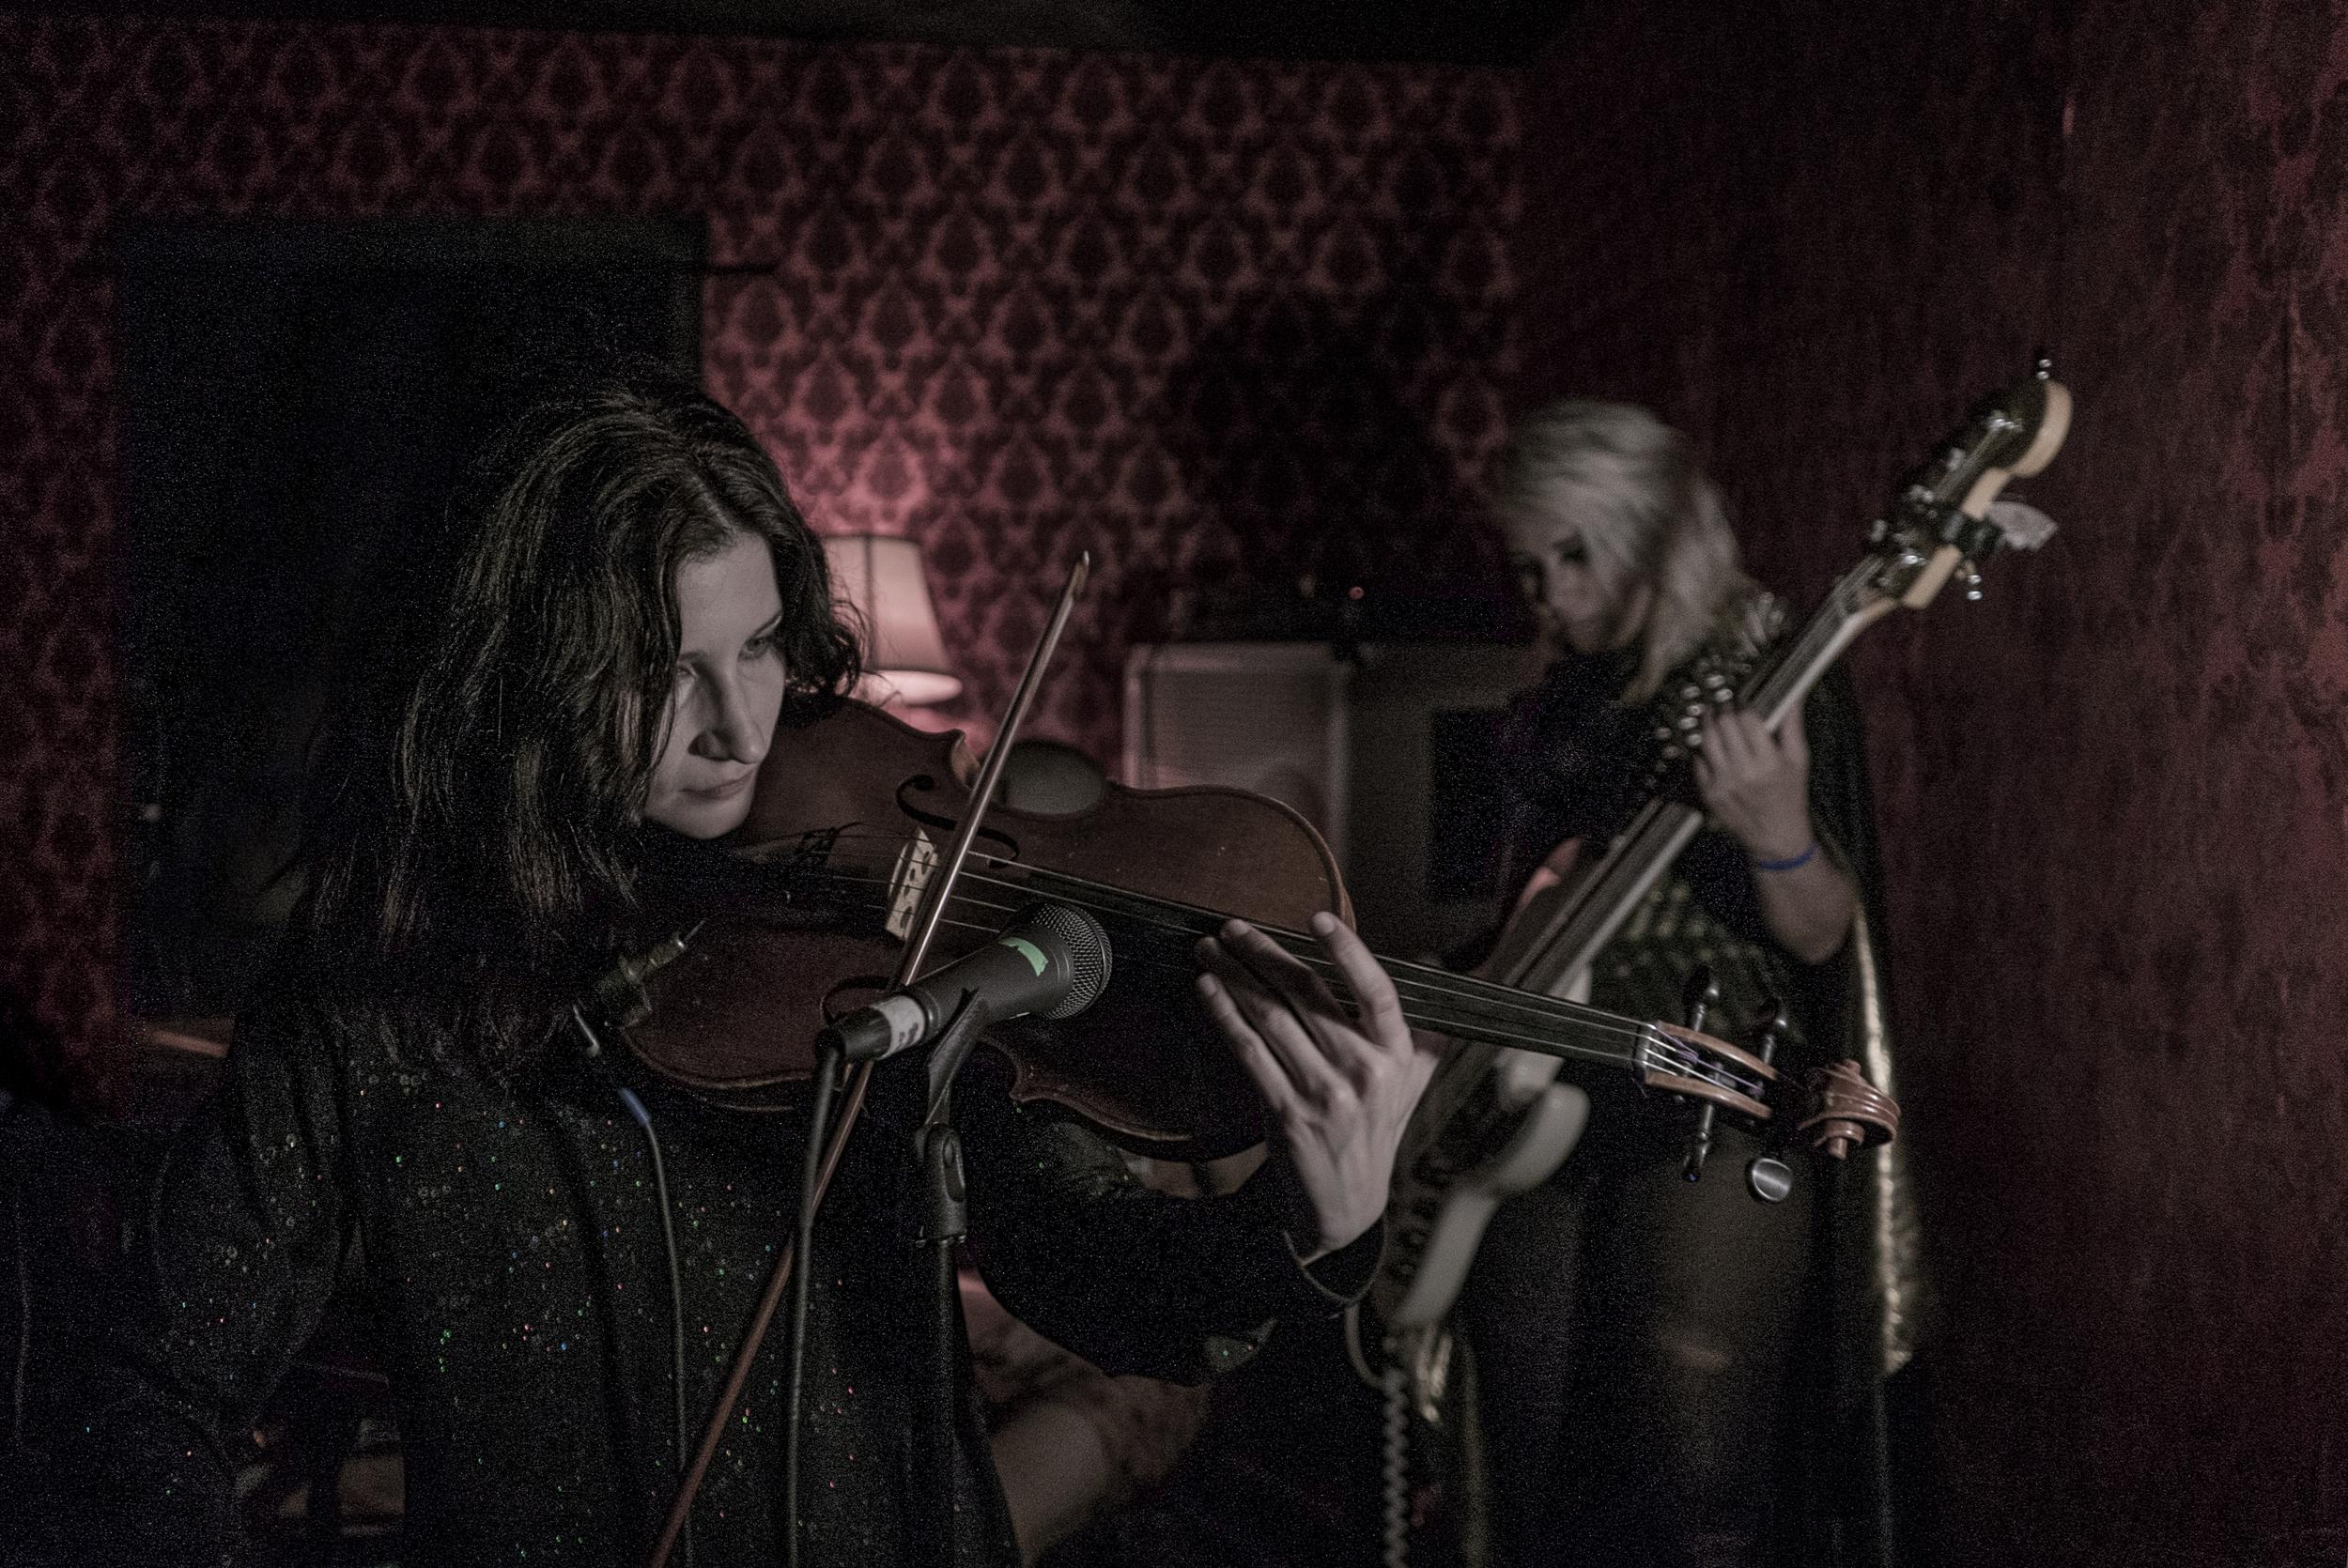 david-choe-mangchi-under-the-cobbletones-lulu-east-coast-tour-2016-tour-live-music-5.jpg